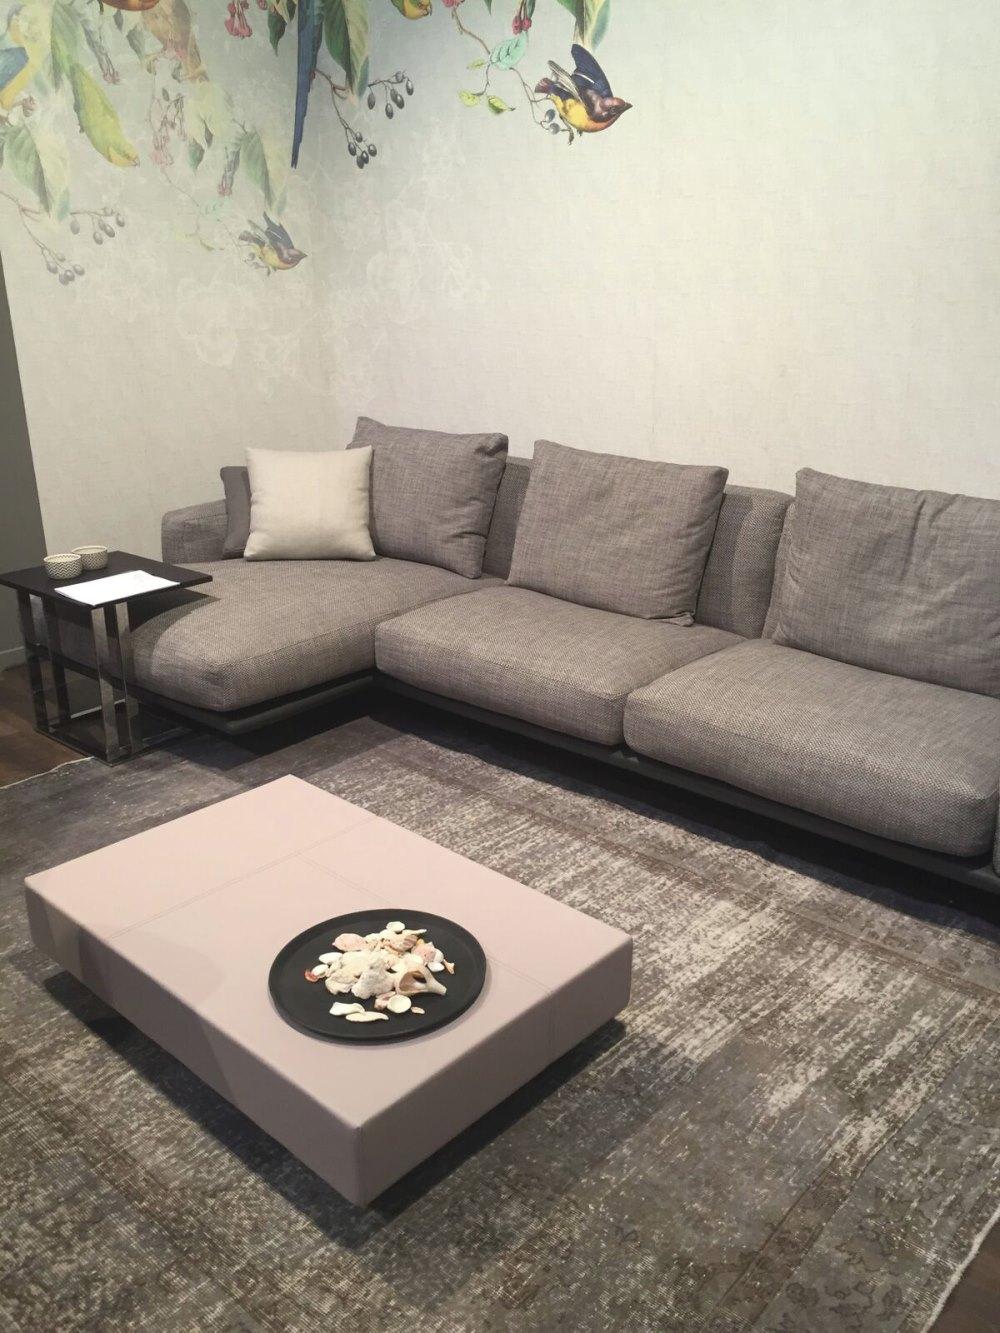 Go-one-shade-lighter-for-your-sofa-throw-pillows